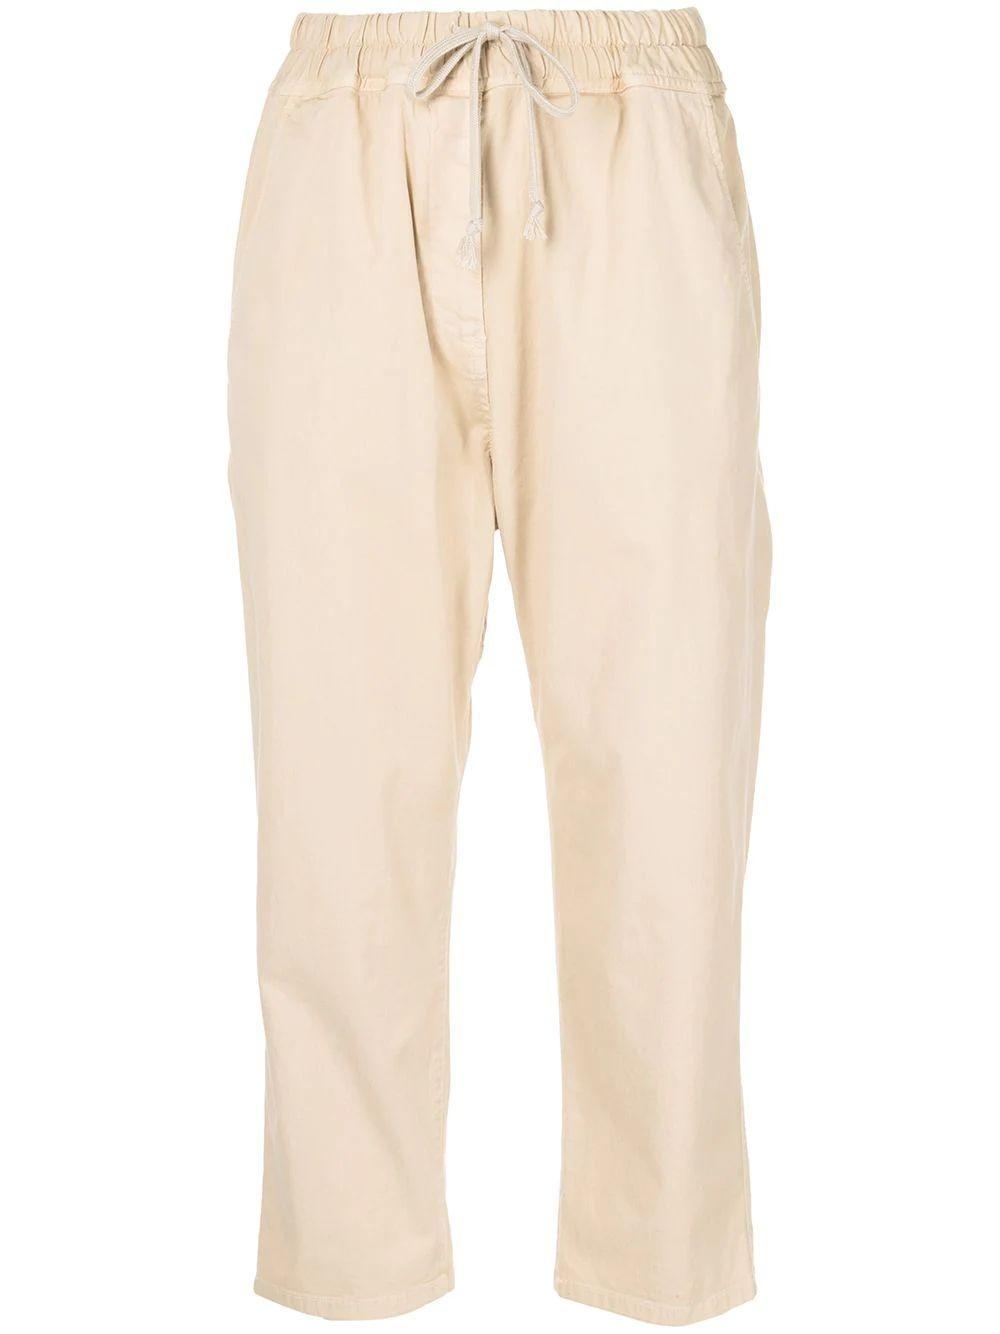 Casablanca Drawstring Pants Item # 11343-W11